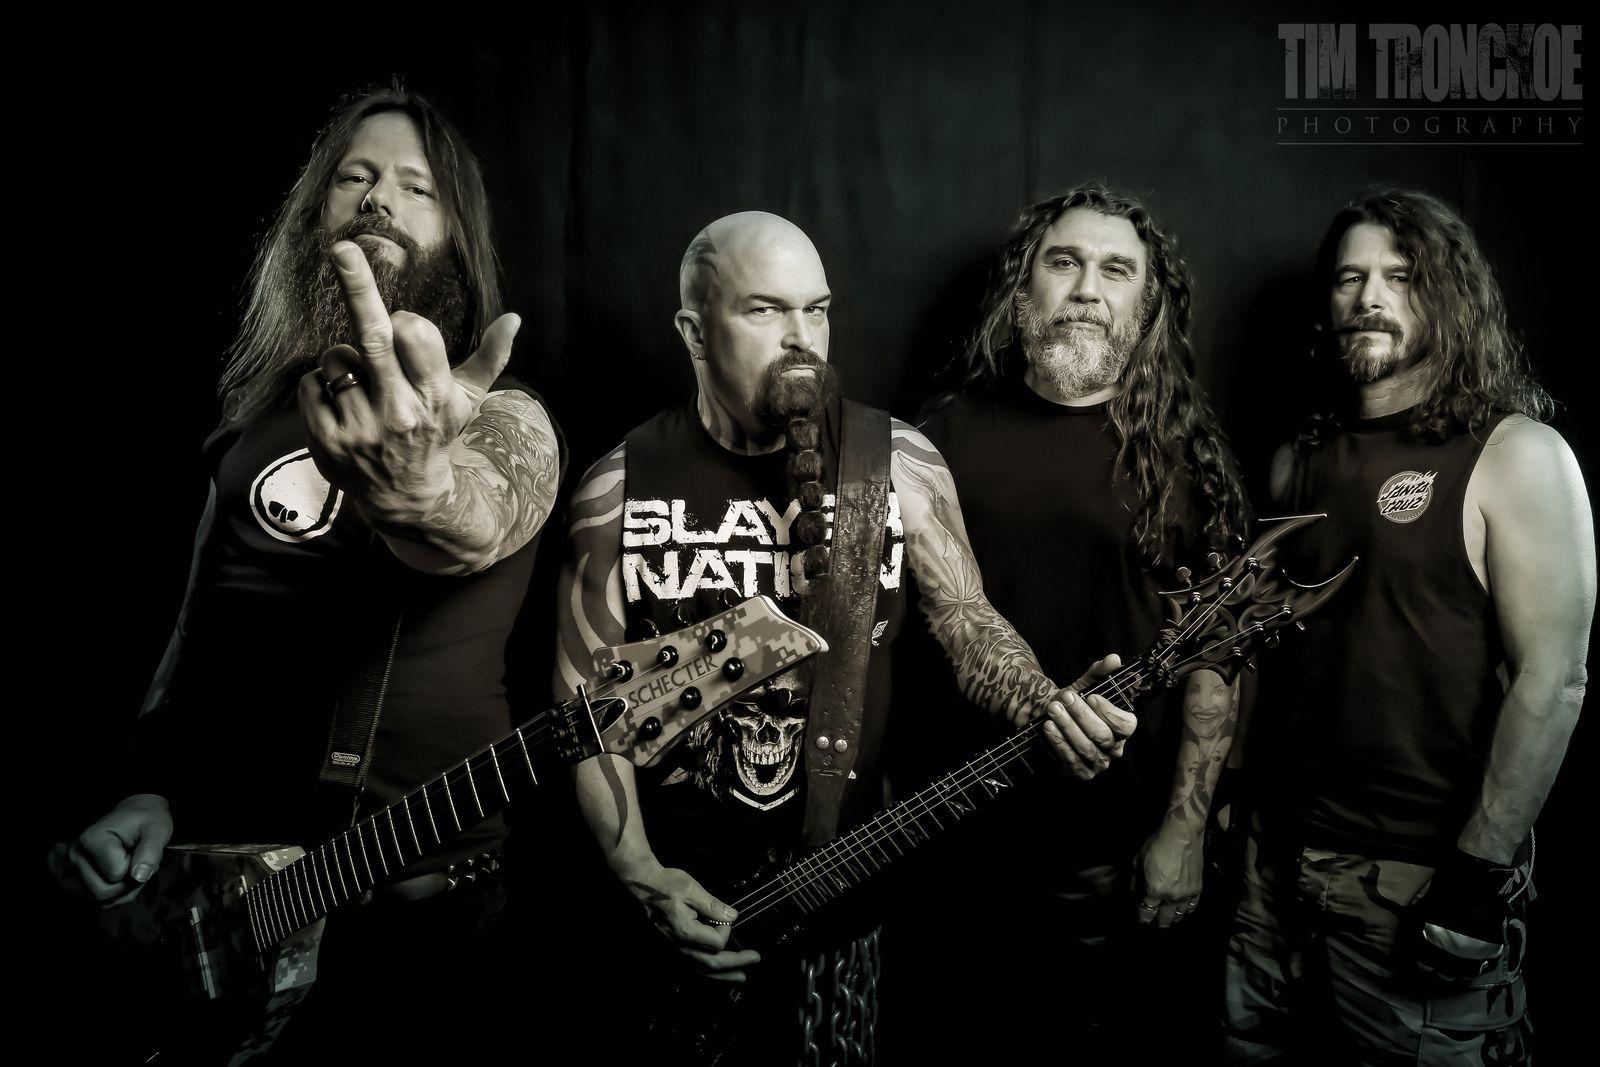 Трэш метал группы фото